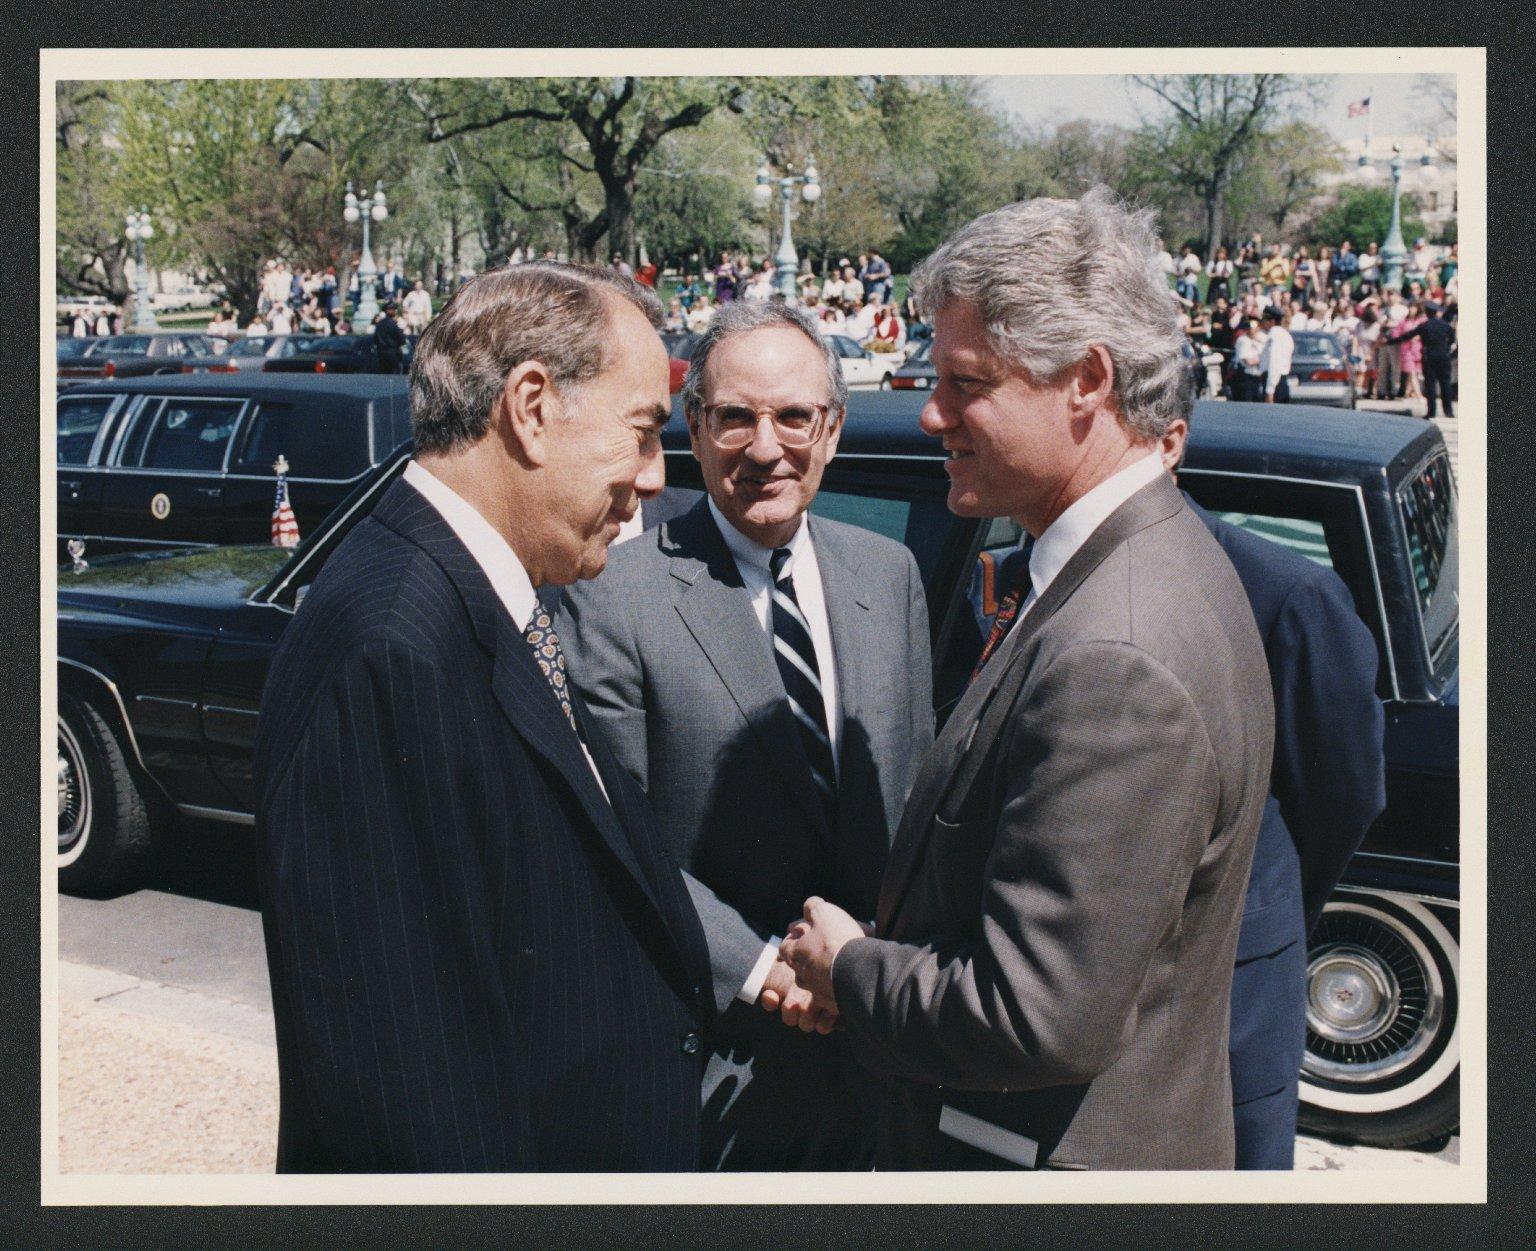 Senator Bob Dole and Bill Clinton conversing, 1994